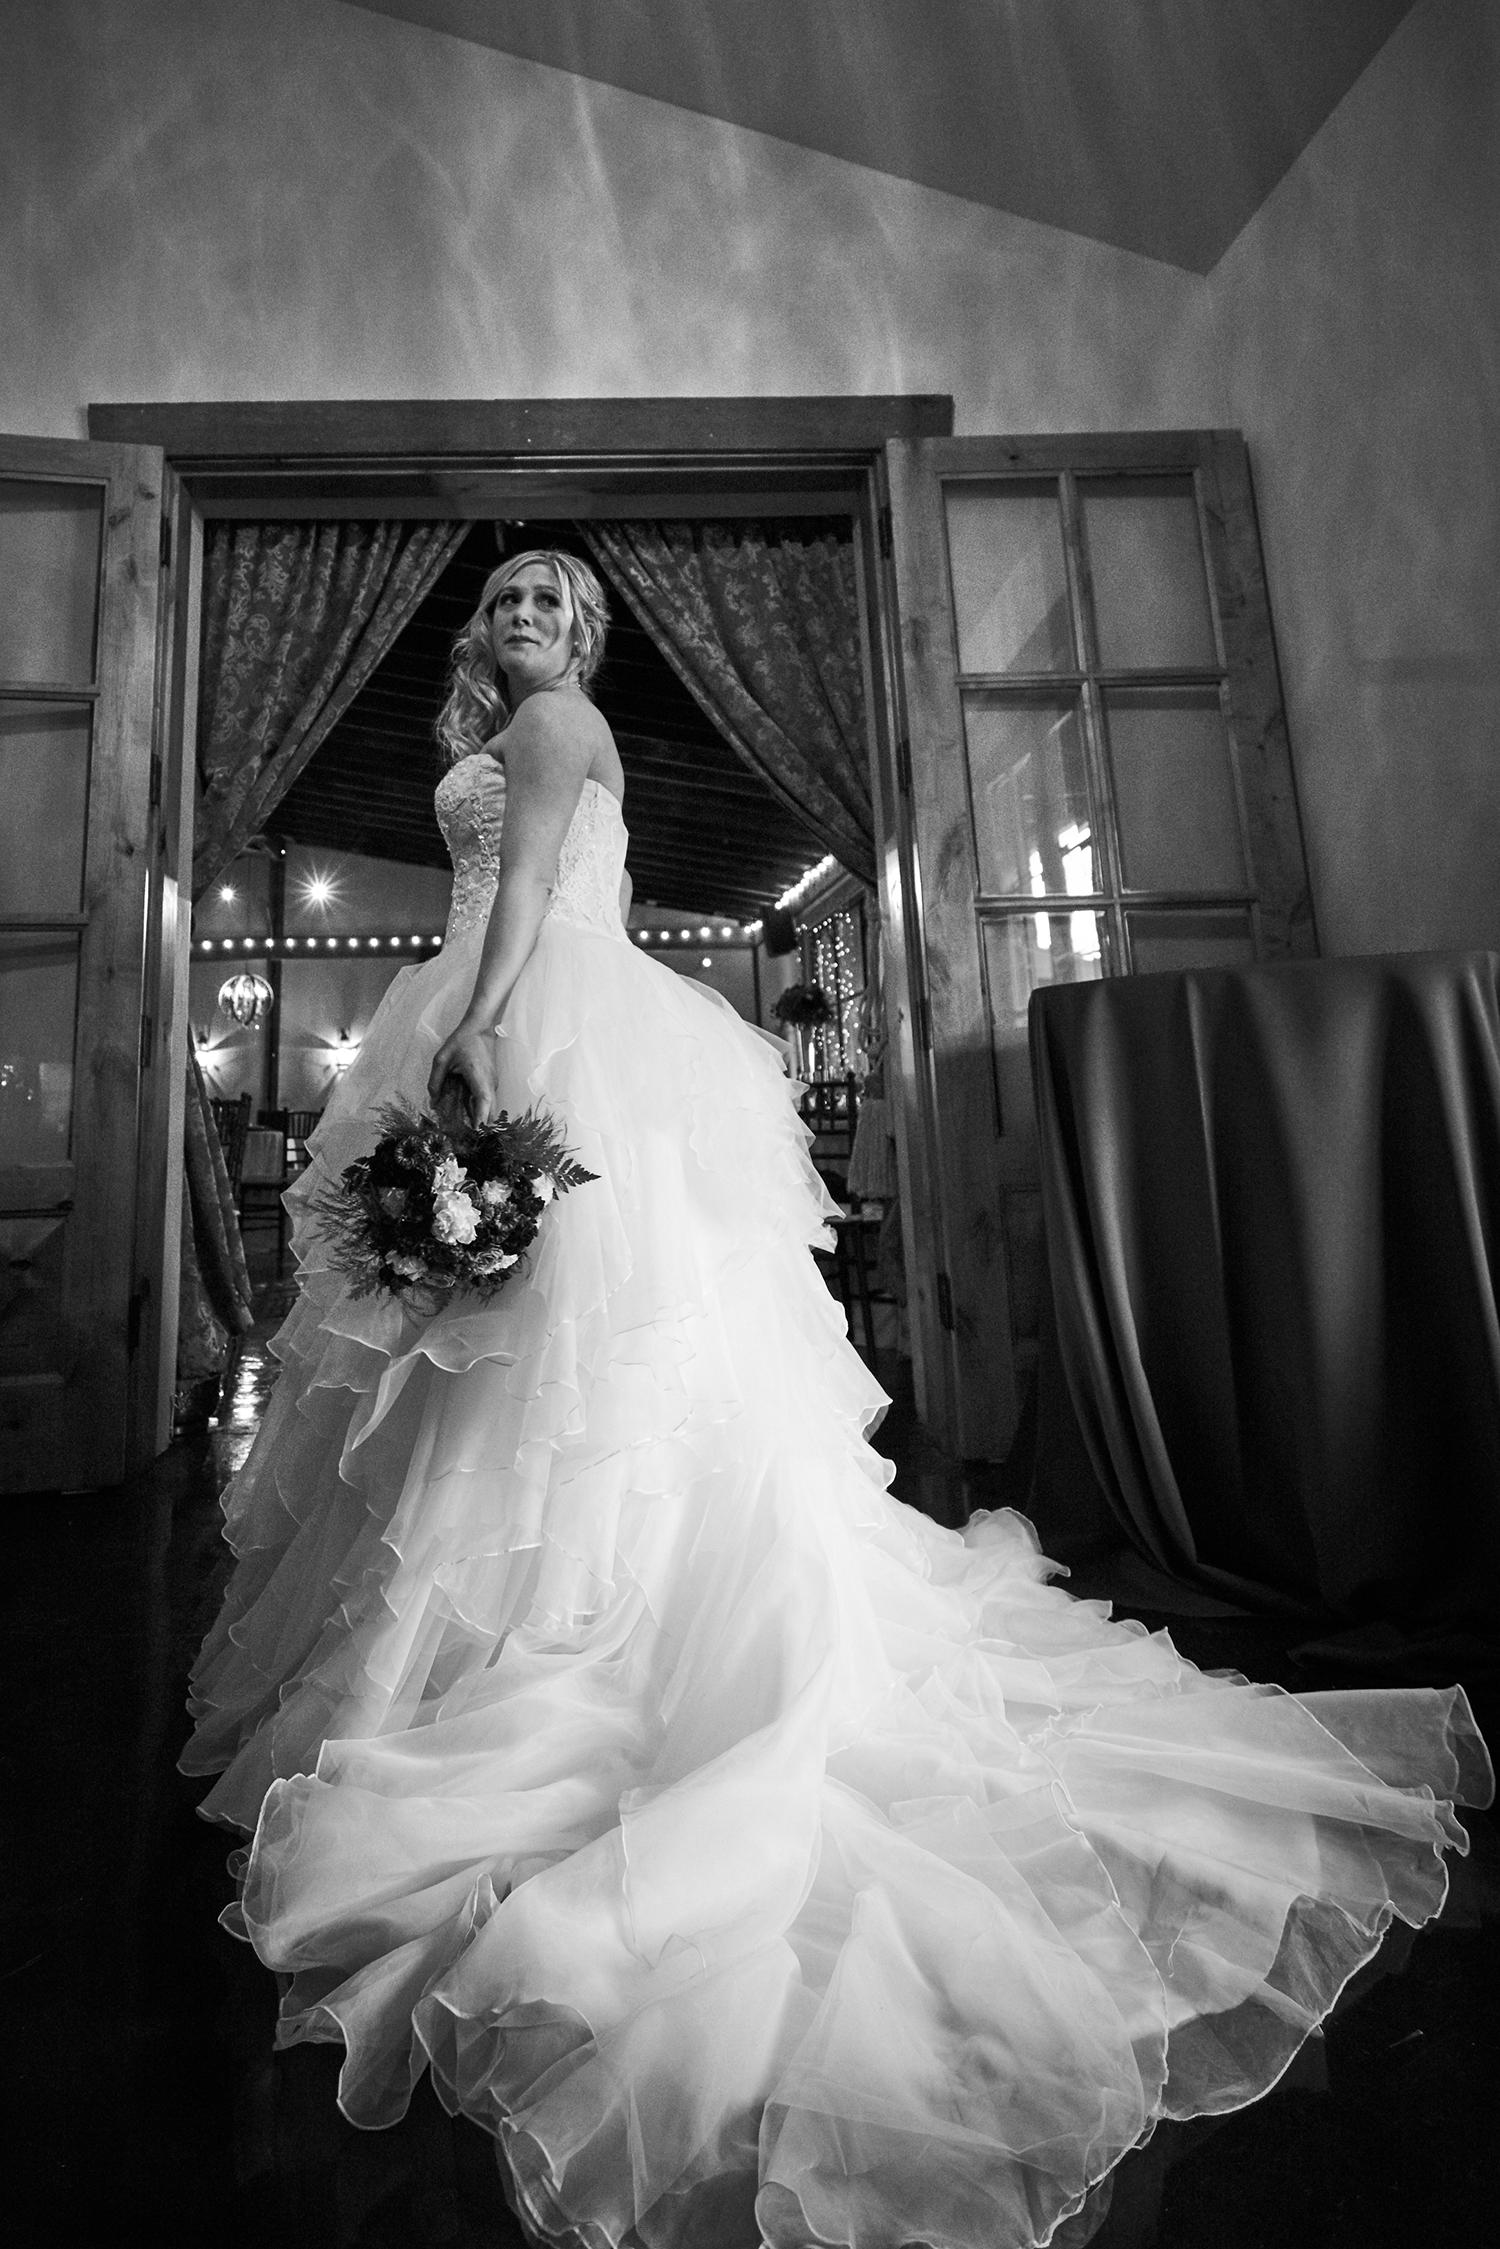 Luxchromatic_Wedding_Photographer__Bride_Best_Bay_Area_San_Francisco_San_Jose_Sony_Alpha_Profoto_0419.png